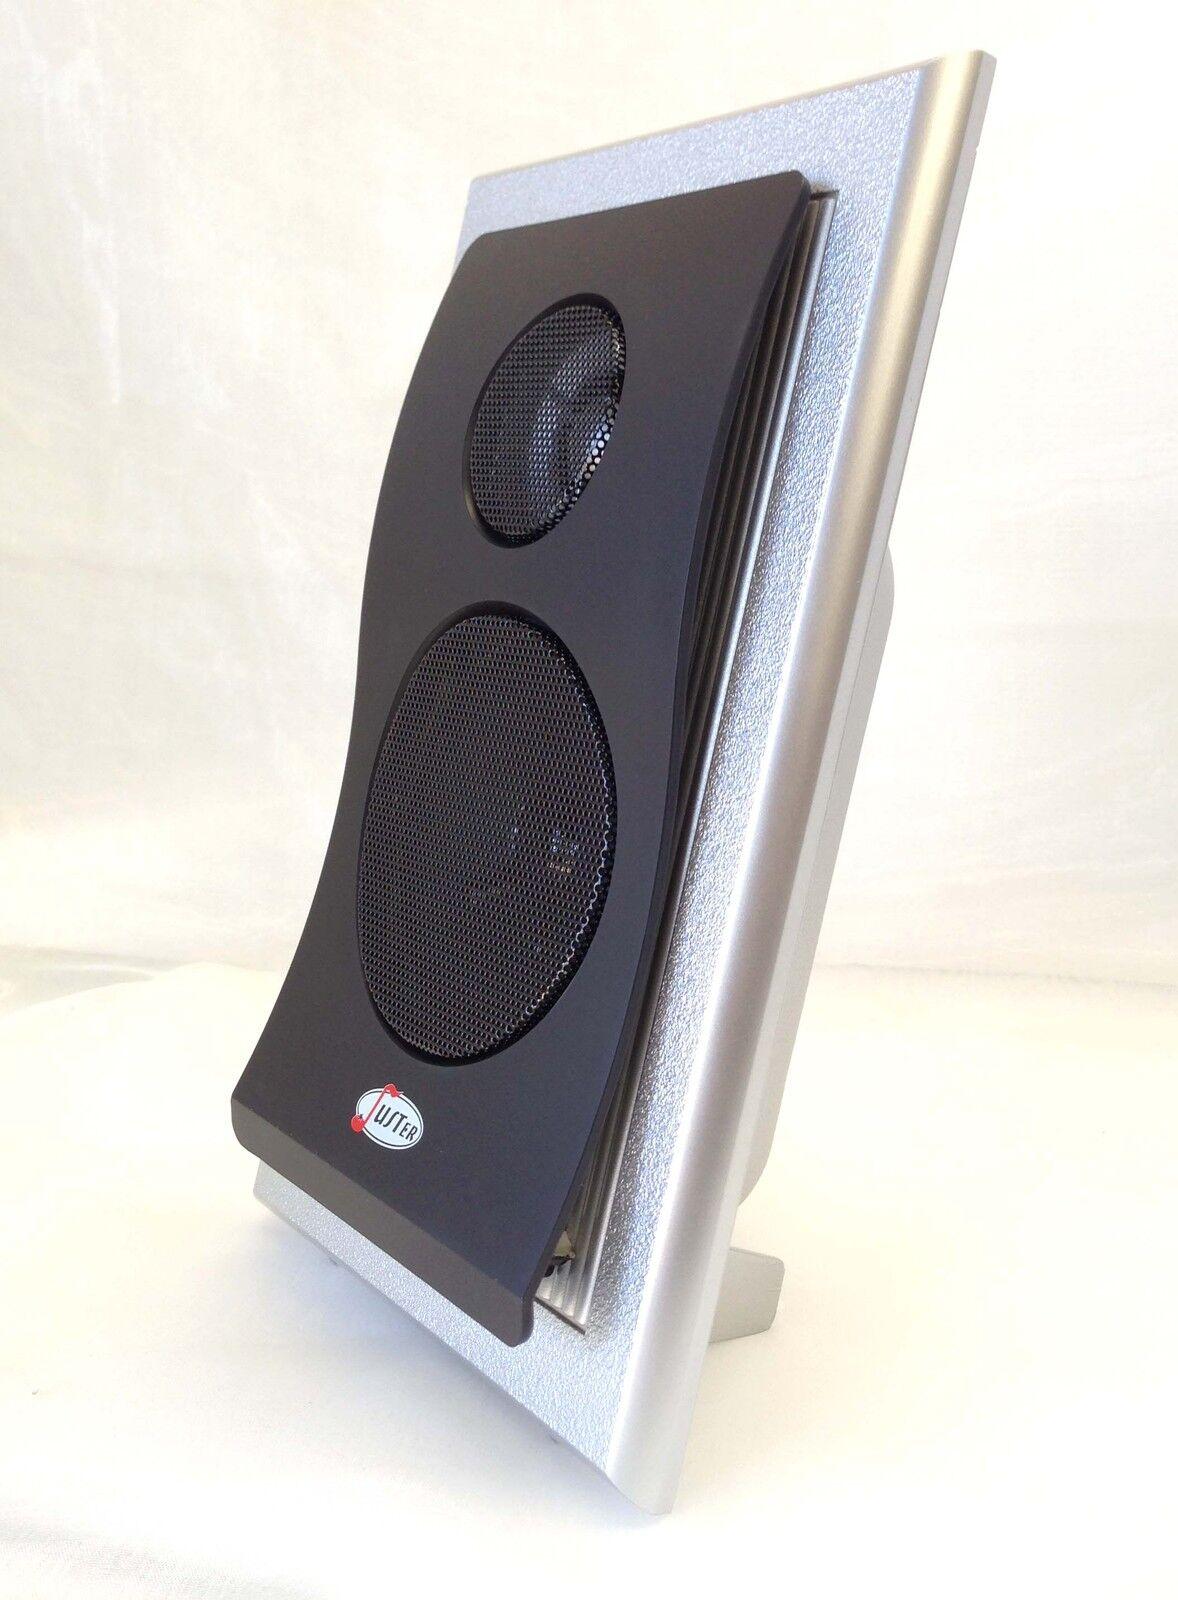 Juster 3d 602 Multimedia 21 Speaker System For Desktop Pc Mp3 Quatro 2 Super Loud 20 Usb By Sonicgear Green 3 Of 6